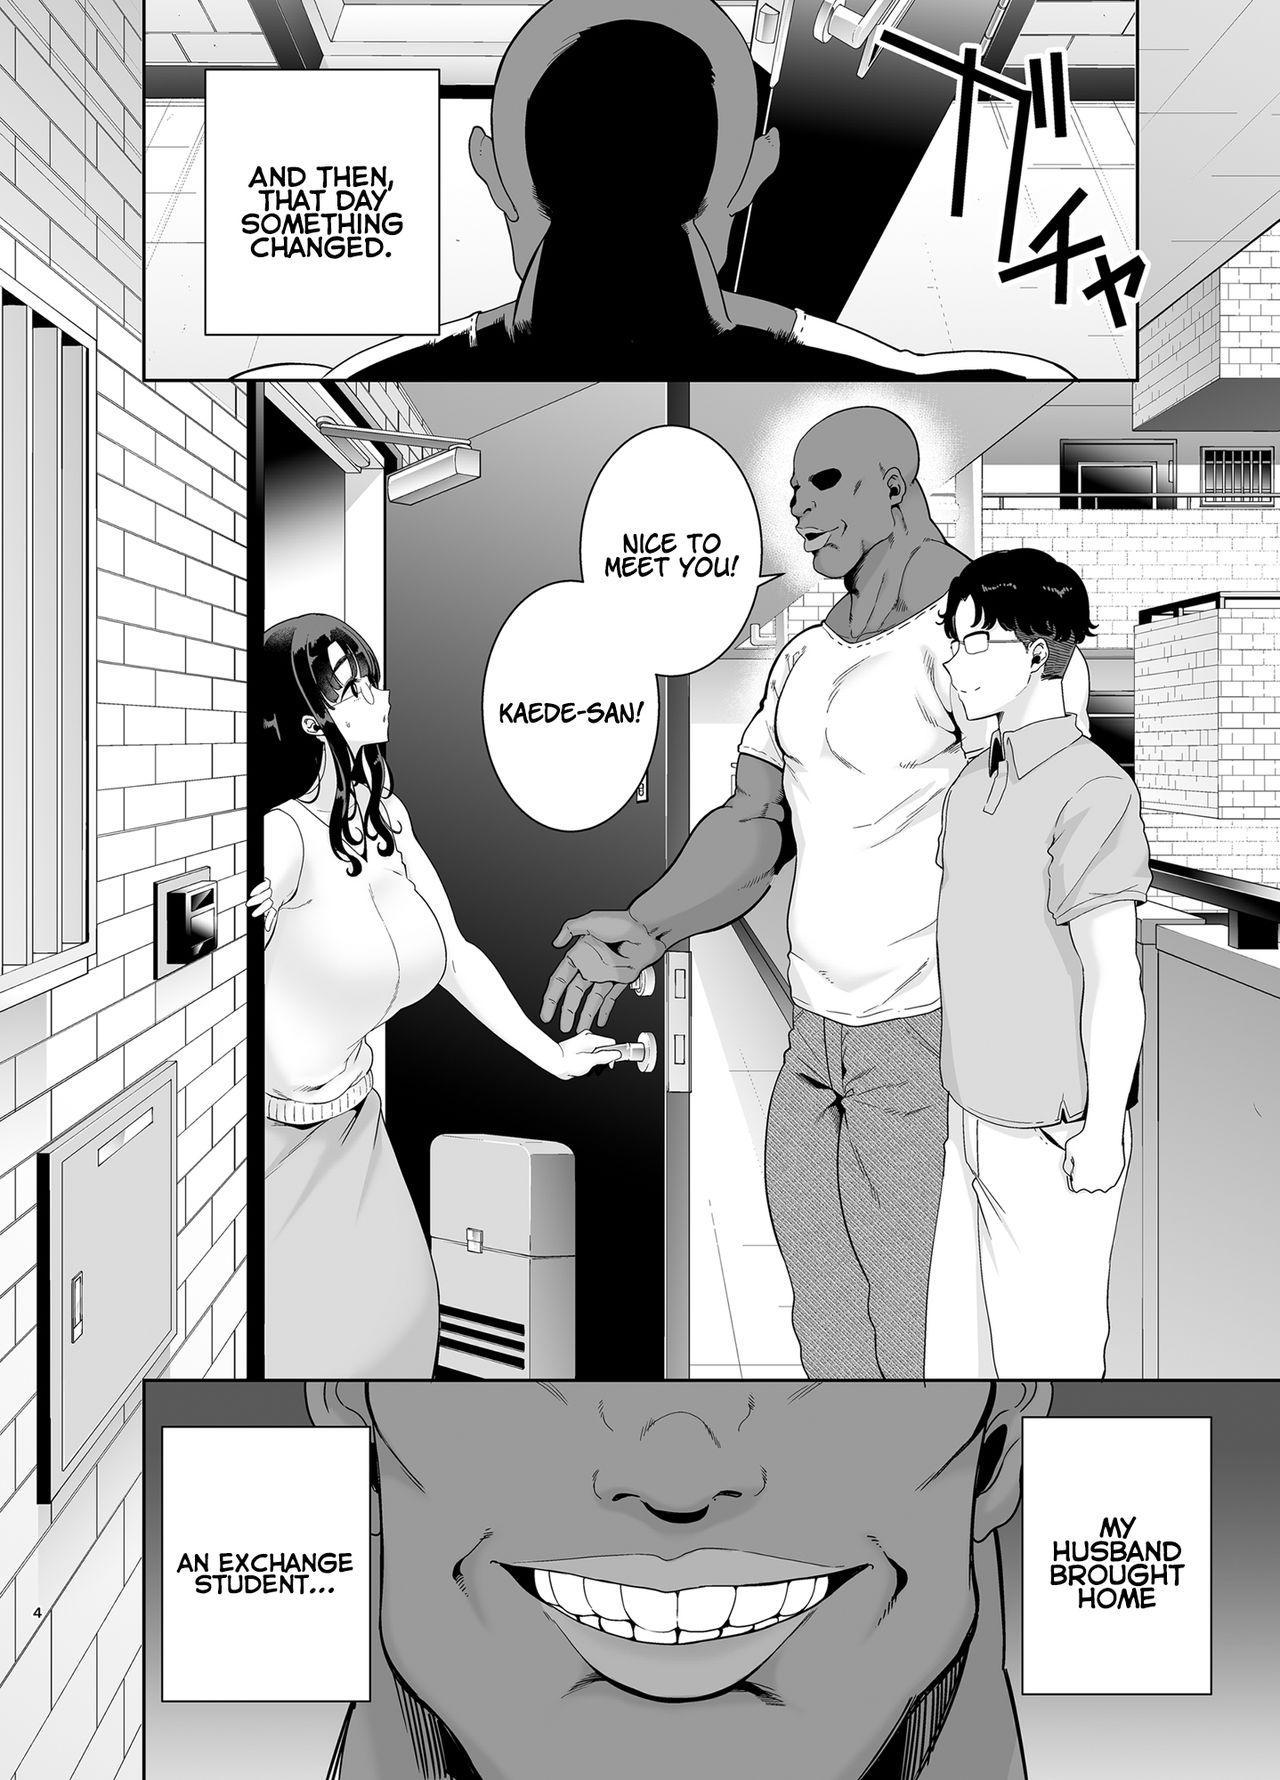 [DOLL PLAY (Kurosu Gatari)] Wild-shiki Nihonjin Tsuma no Netorikata Sono Ichi   Wild Method - How to Steal a Japanese Housewife - Part One [English] [Coffedrug] [Digital] 2